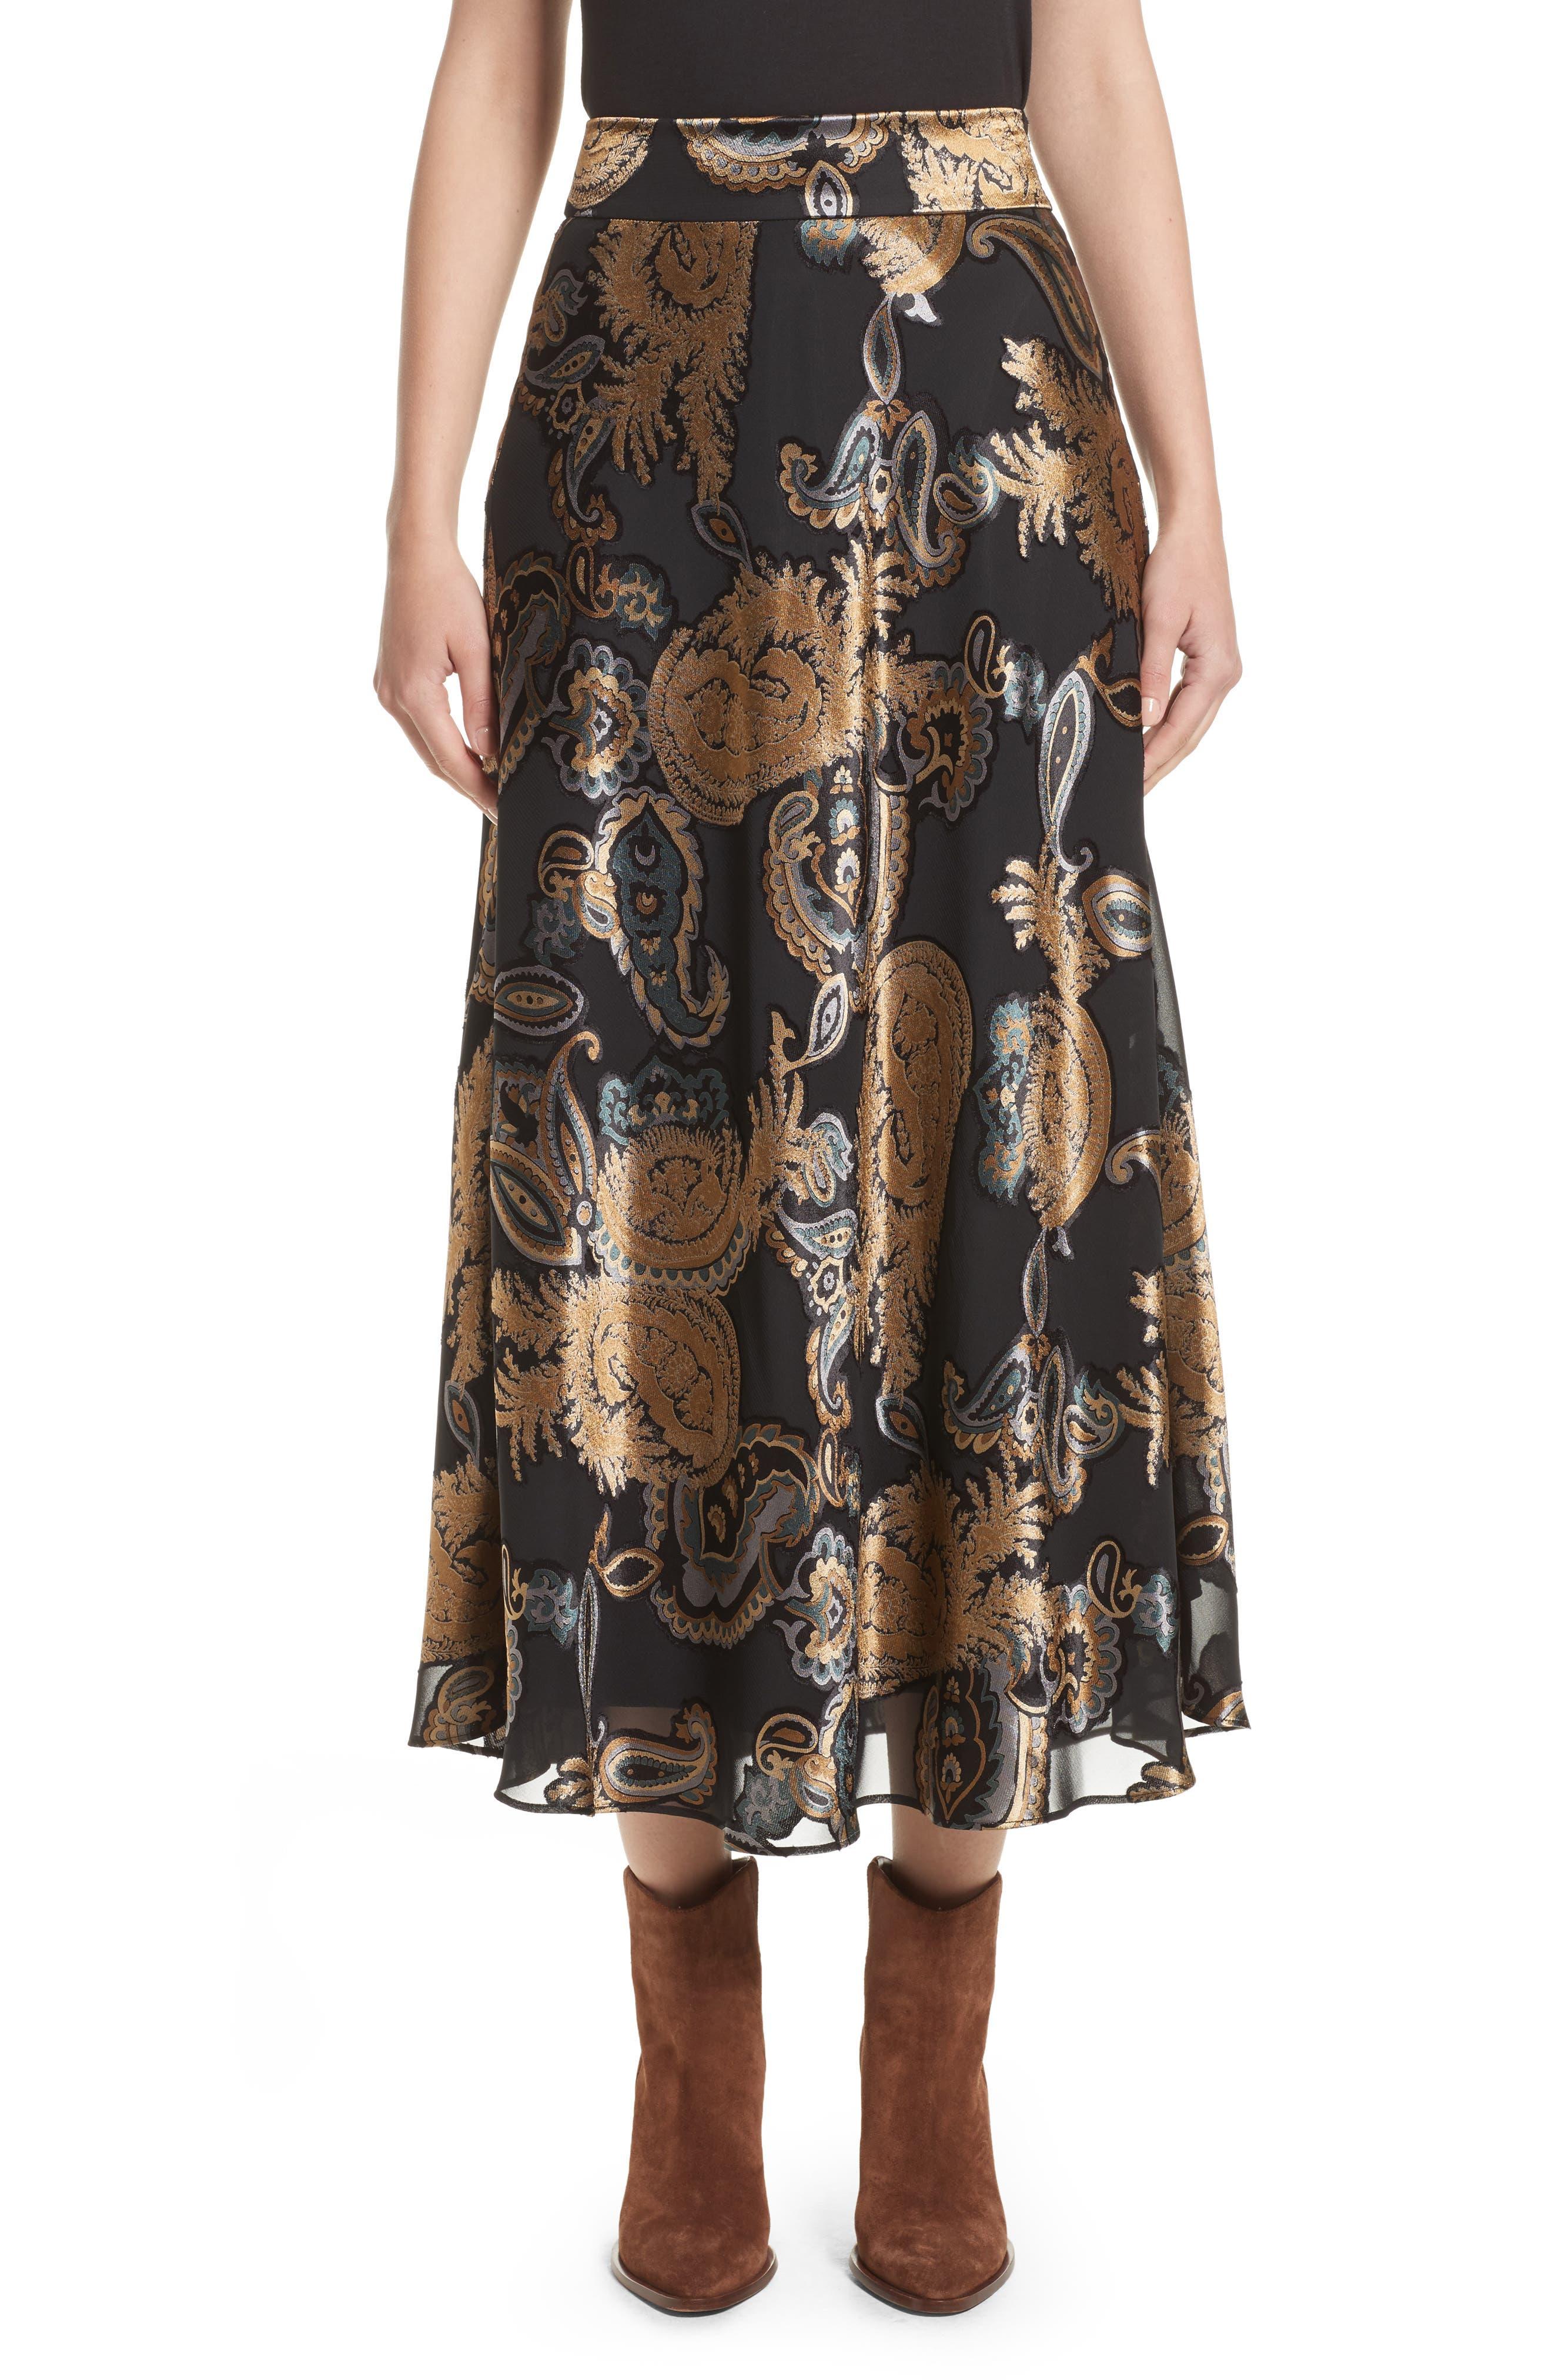 Alternate Image 1 Selected - Lafayette 148 New York Kamara Renaissance Paisley Devoré Skirt